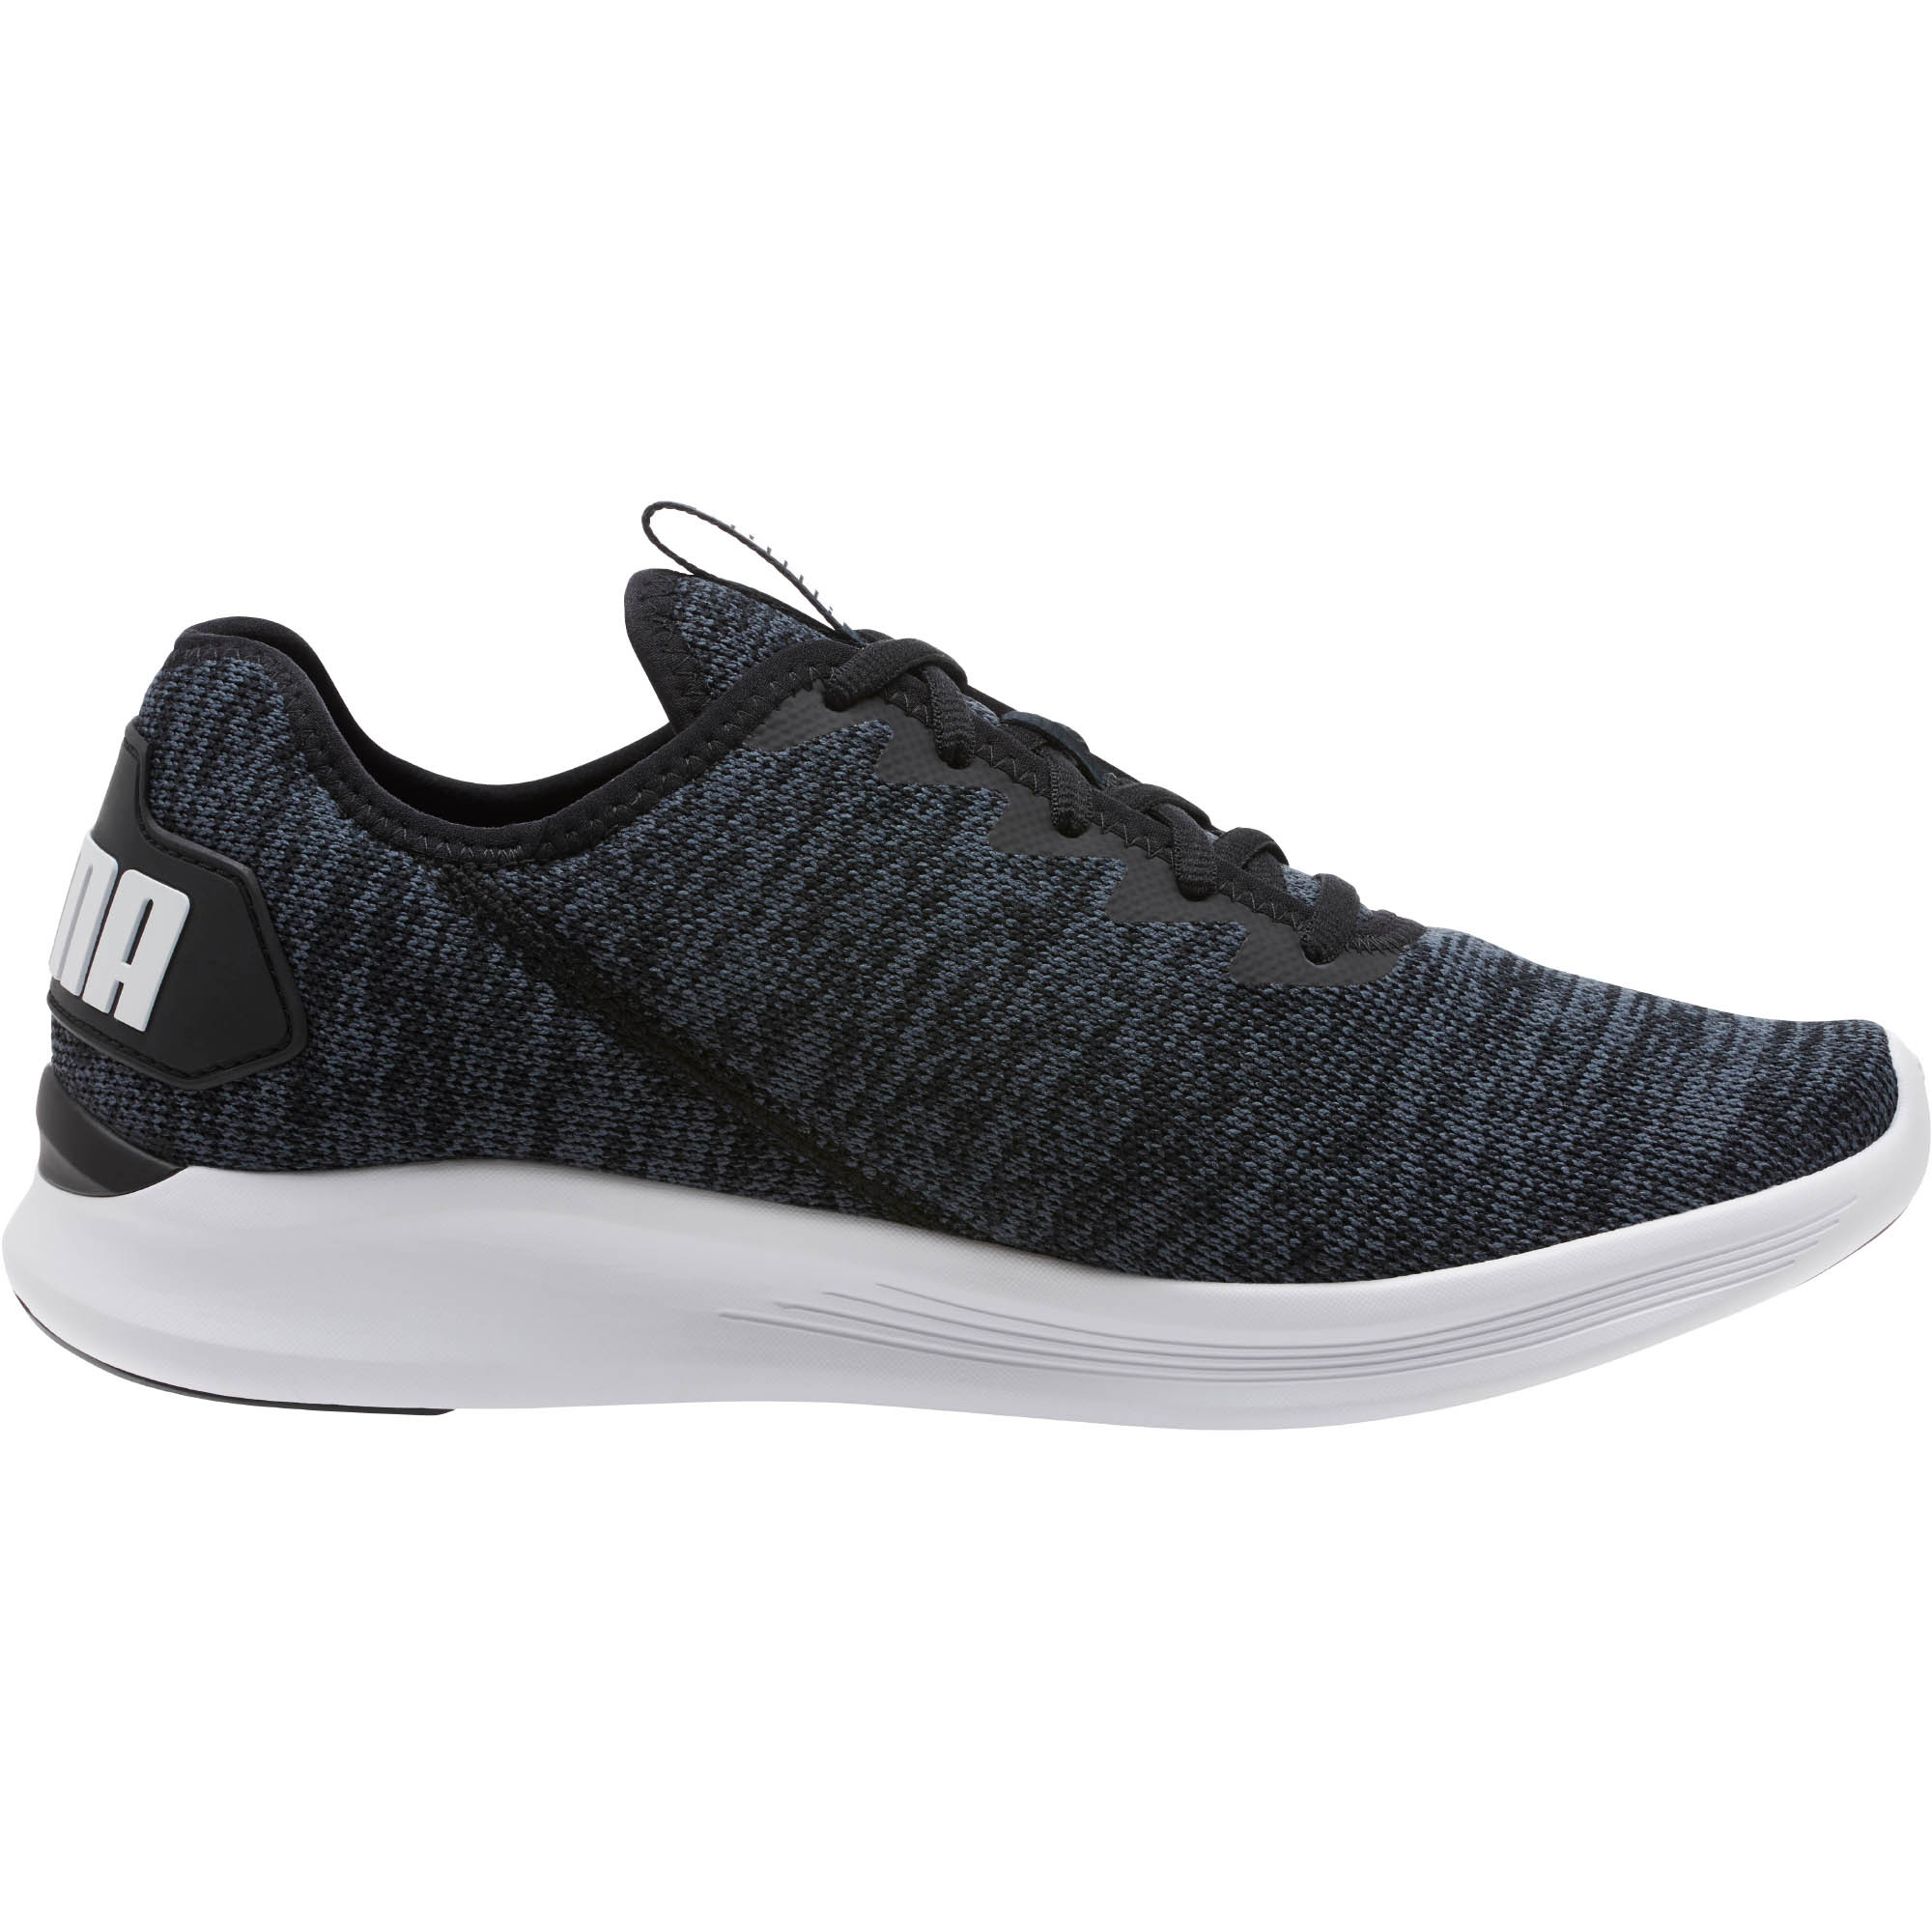 PUMA-Ballast-Men-039-s-Running-Shoes-Men-Shoe-Running thumbnail 12